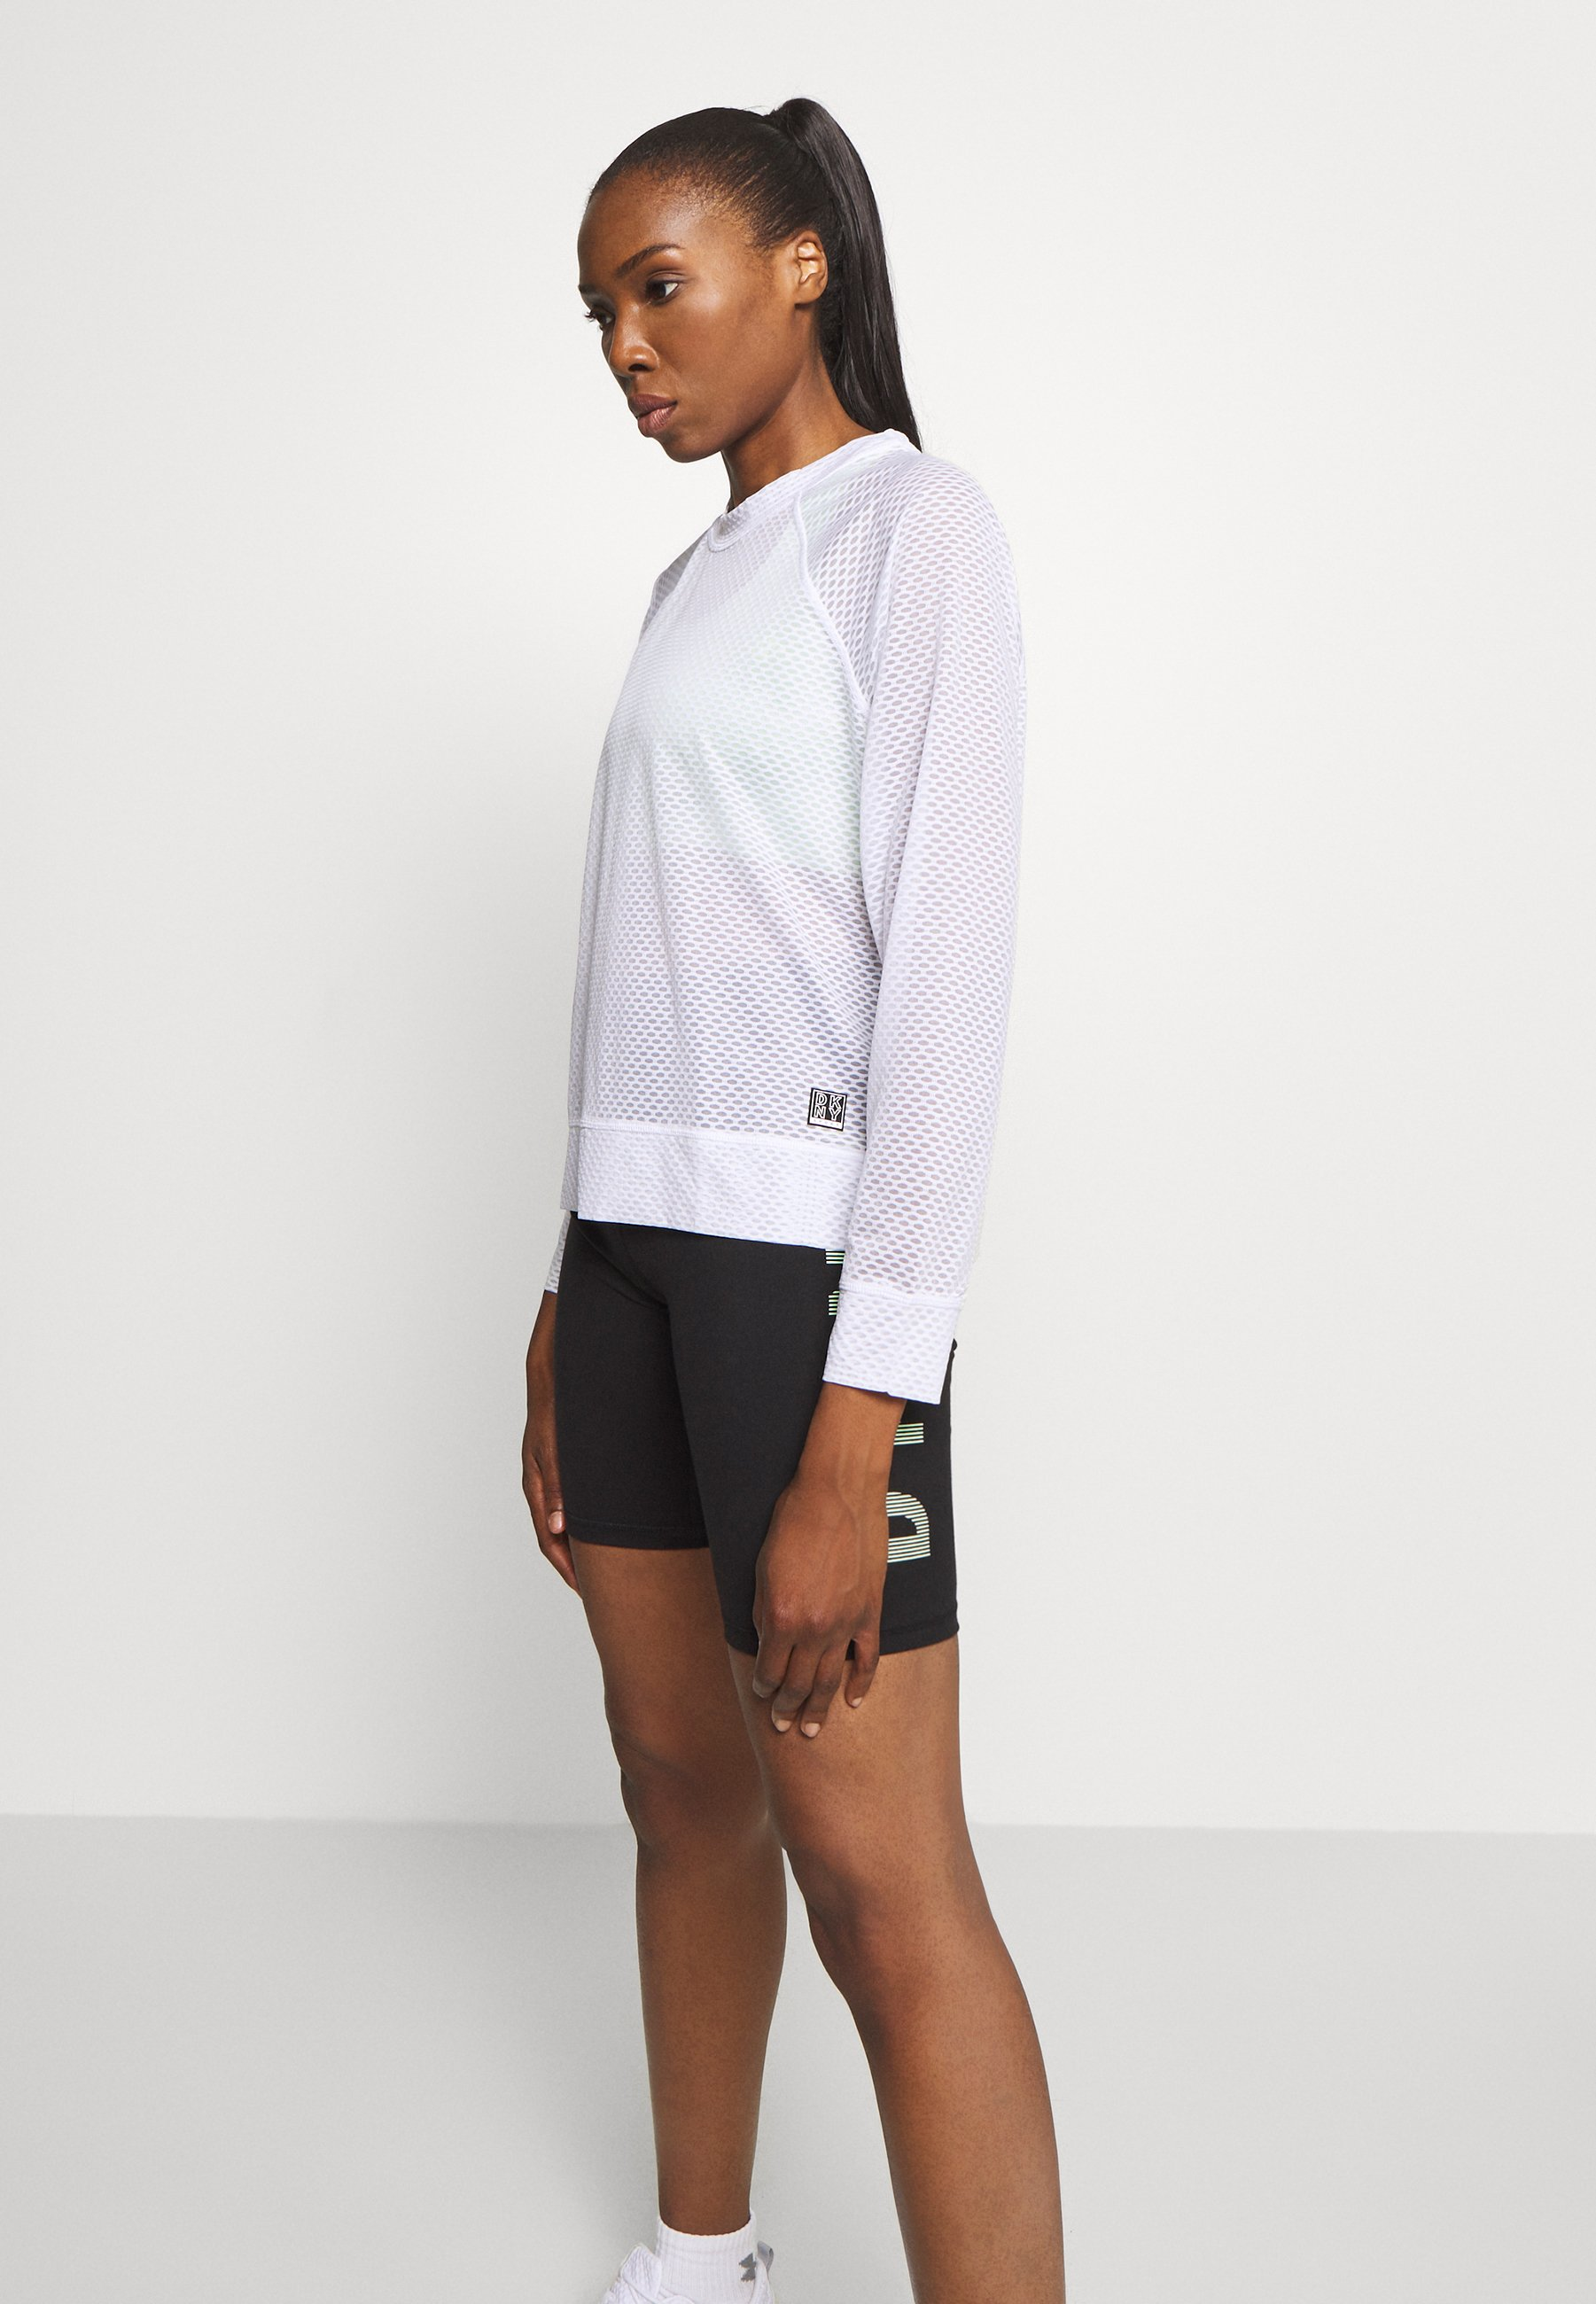 Deporte sexy DKNY HONEYCOMB CREW NECKLONG SLEEVE PULL OVER  Camiseta de manga larga  white oi239